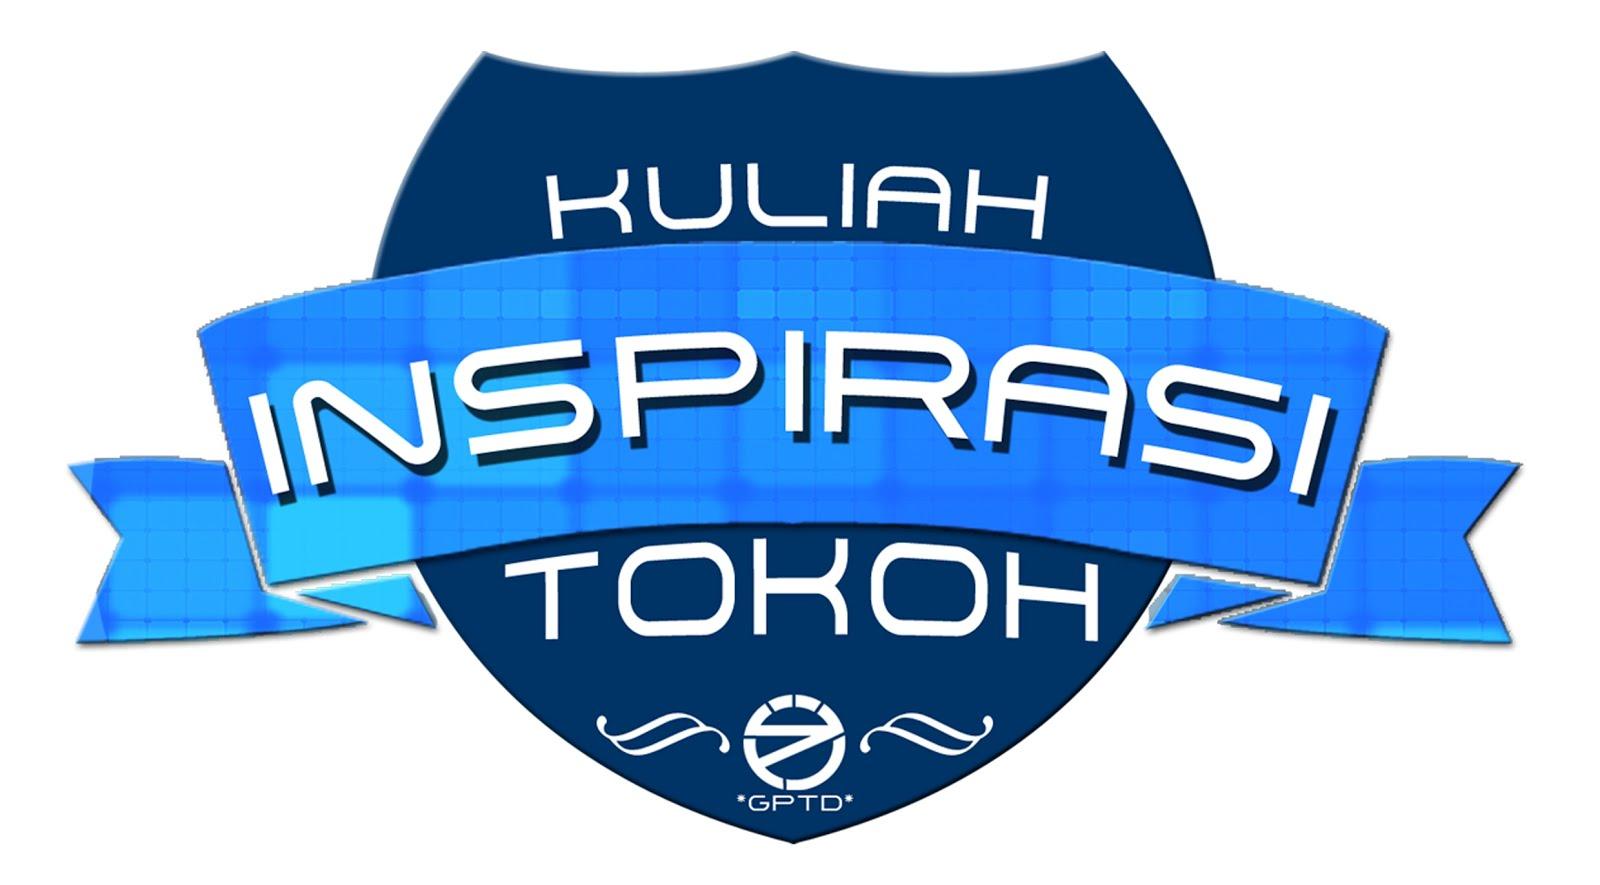 KULIAH INSPIRASI TOKOH